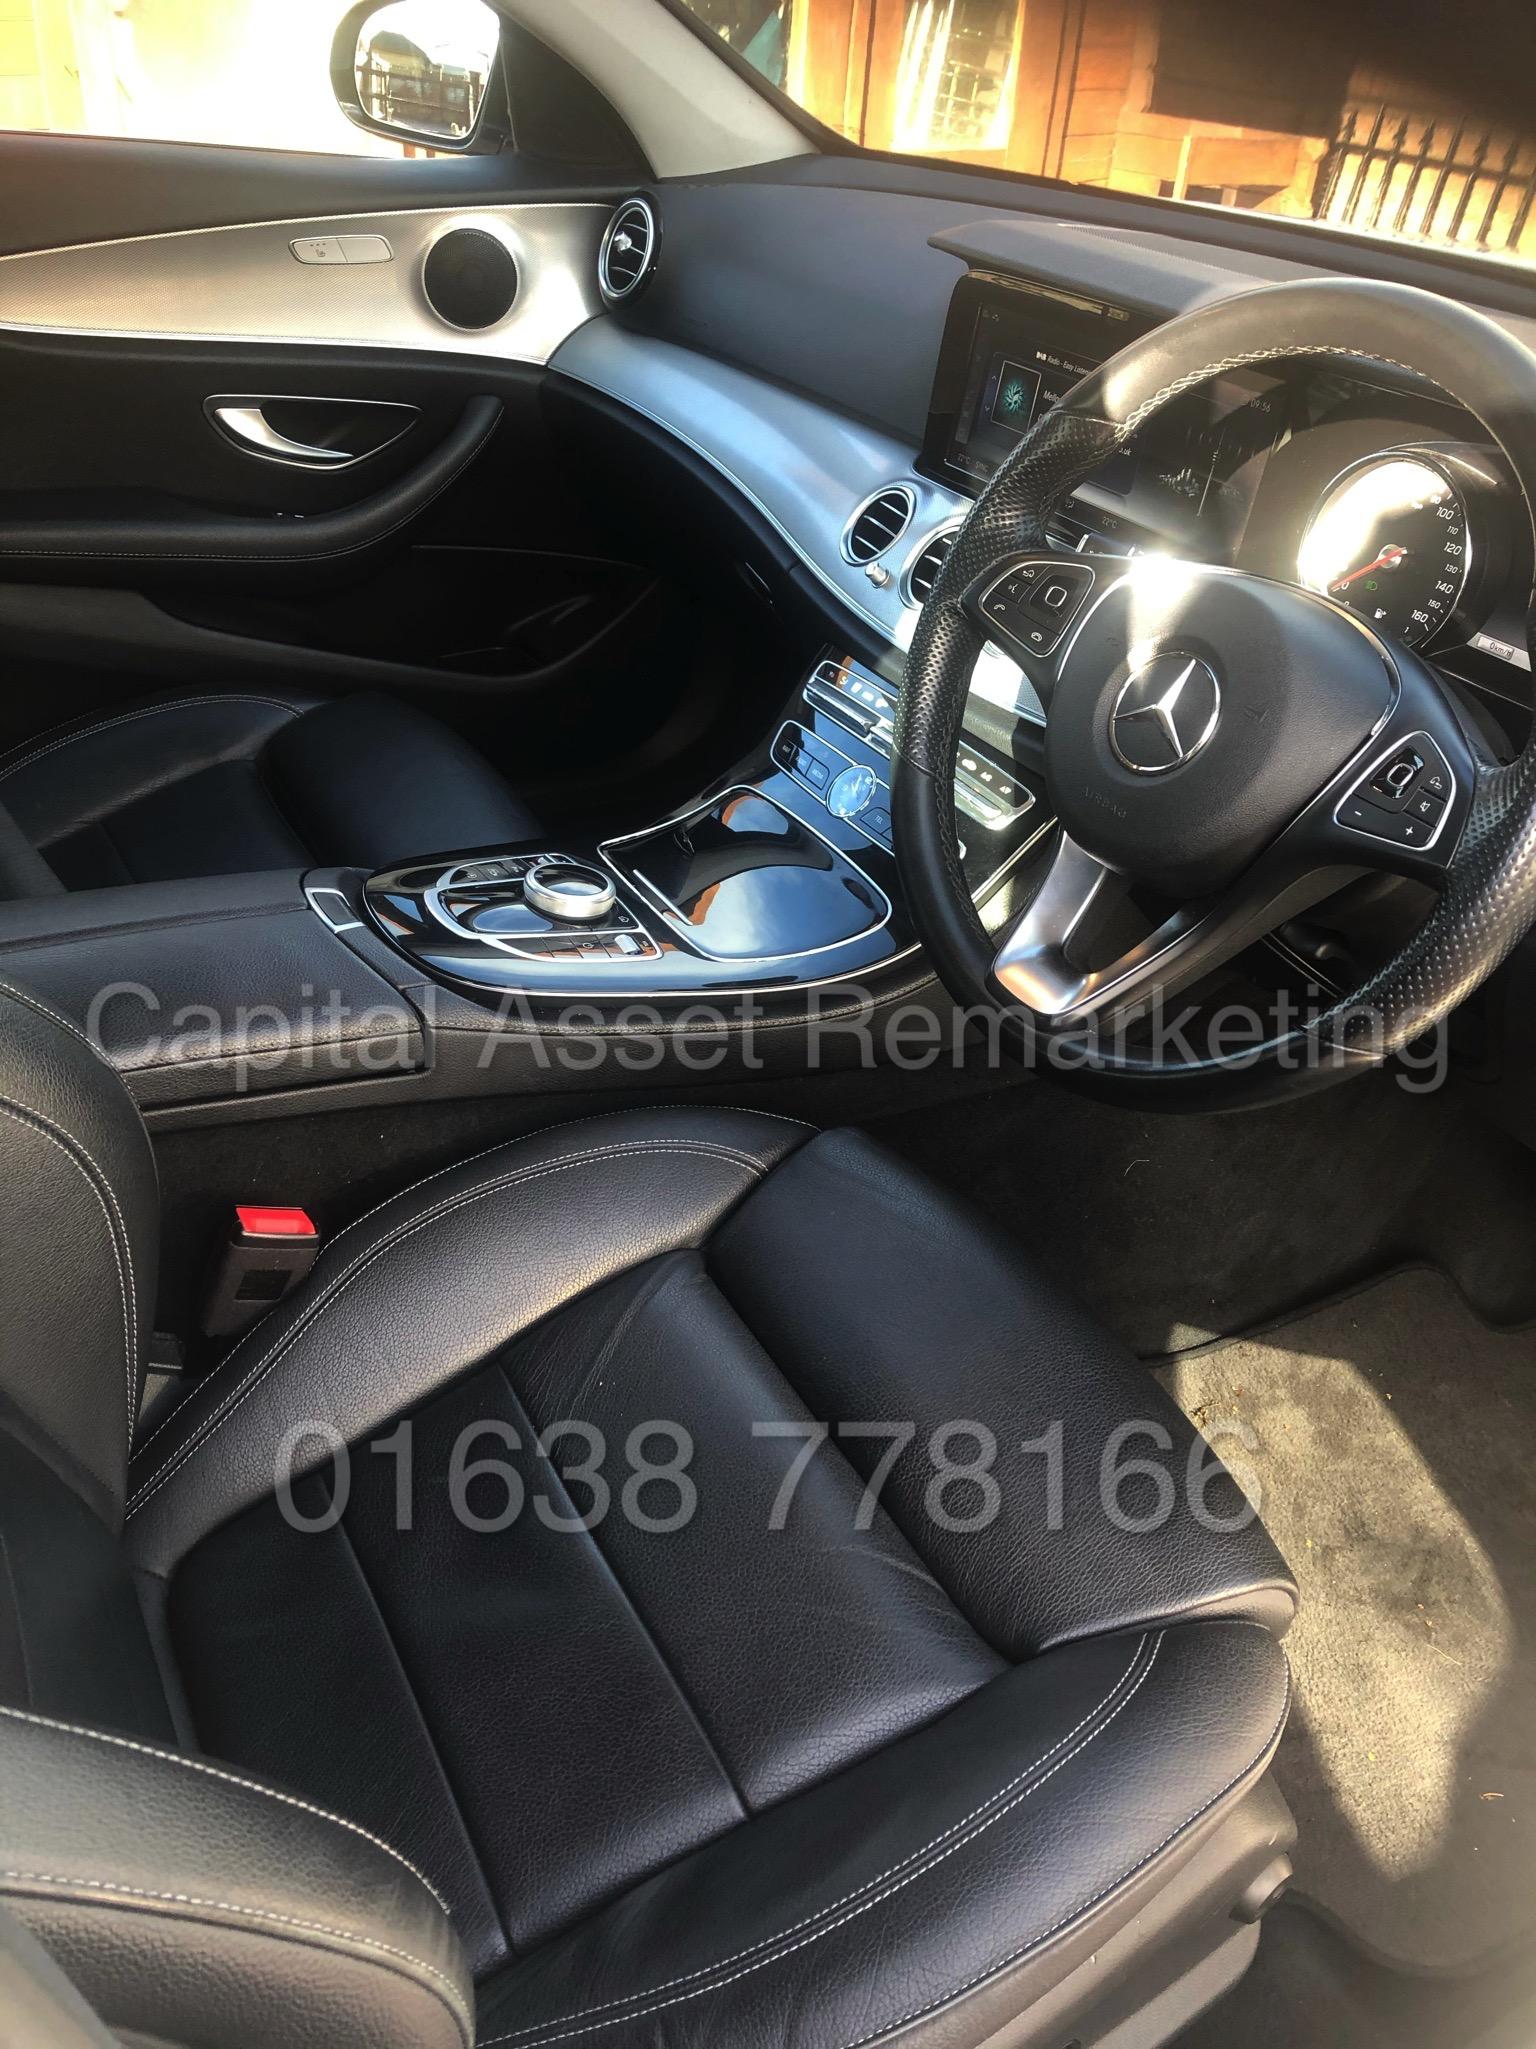 MERCEDES-BENZ E220D *SALOON* (2018 - NEW MODEL) '9-G TRONIC AUTO - LEATHER - SAT NAV' *HUGE SPEC* - Image 17 of 20